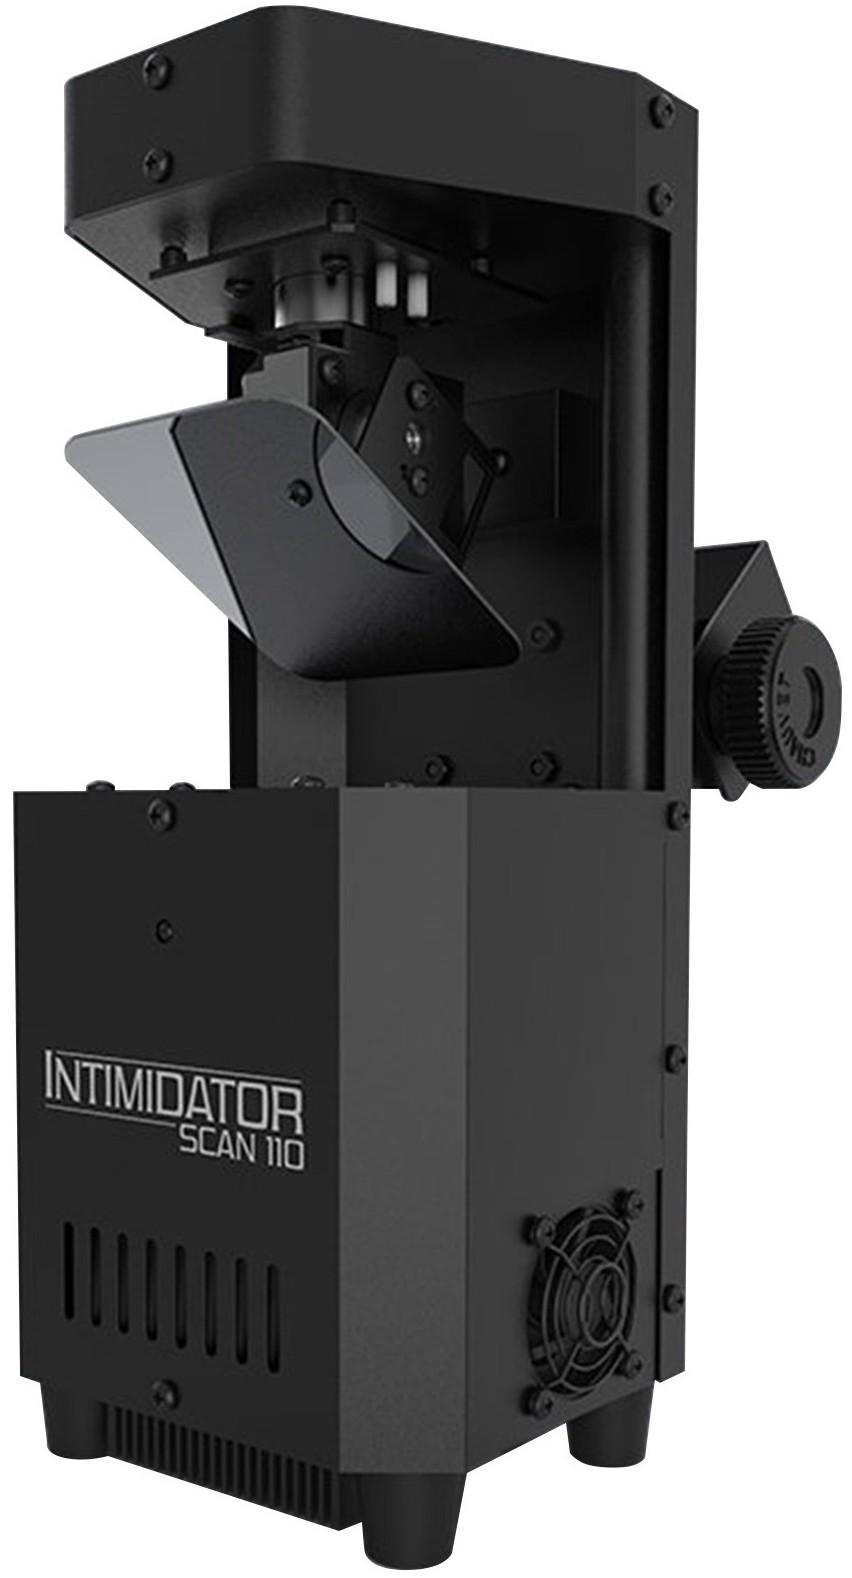 chauvet-dj-intimidator-scan-110.jpeg